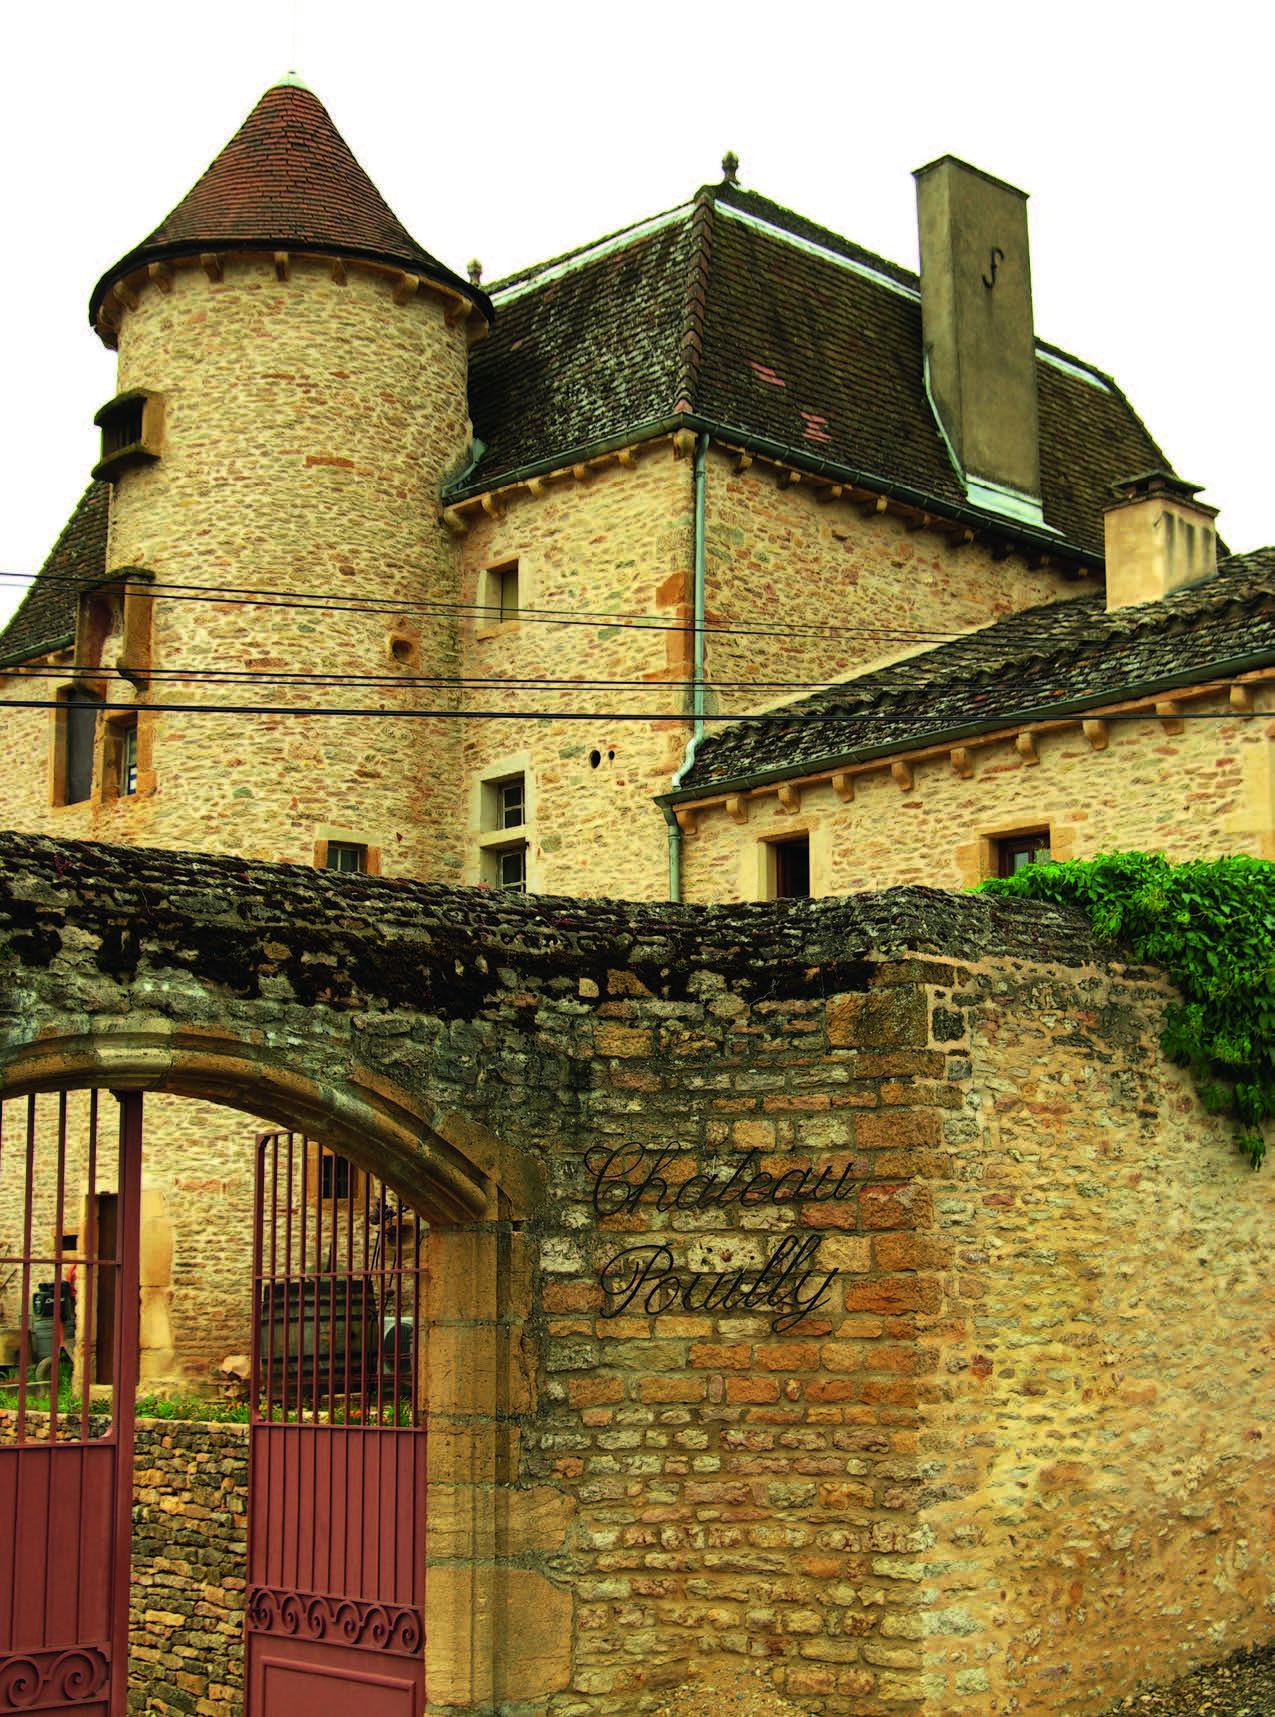 Chateau Pouilly prilygsta dideliam namui